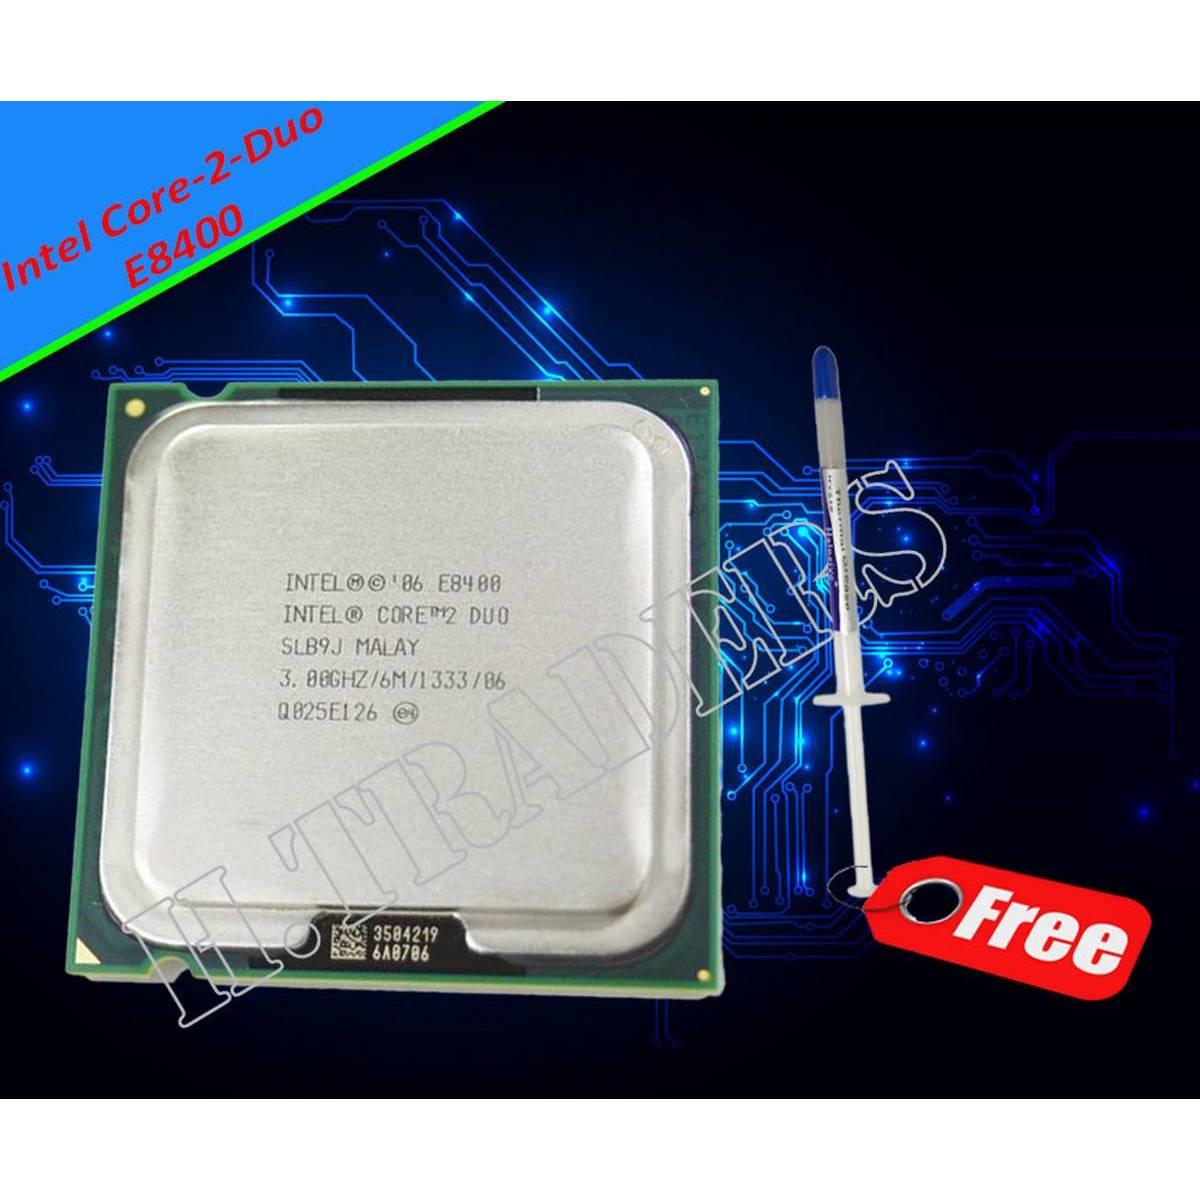 Original Intel Core 2 Duo E8400 Cpu Core 2 Duo Processor E8400 (3.0Ghz/ 6M /1333Ghz)